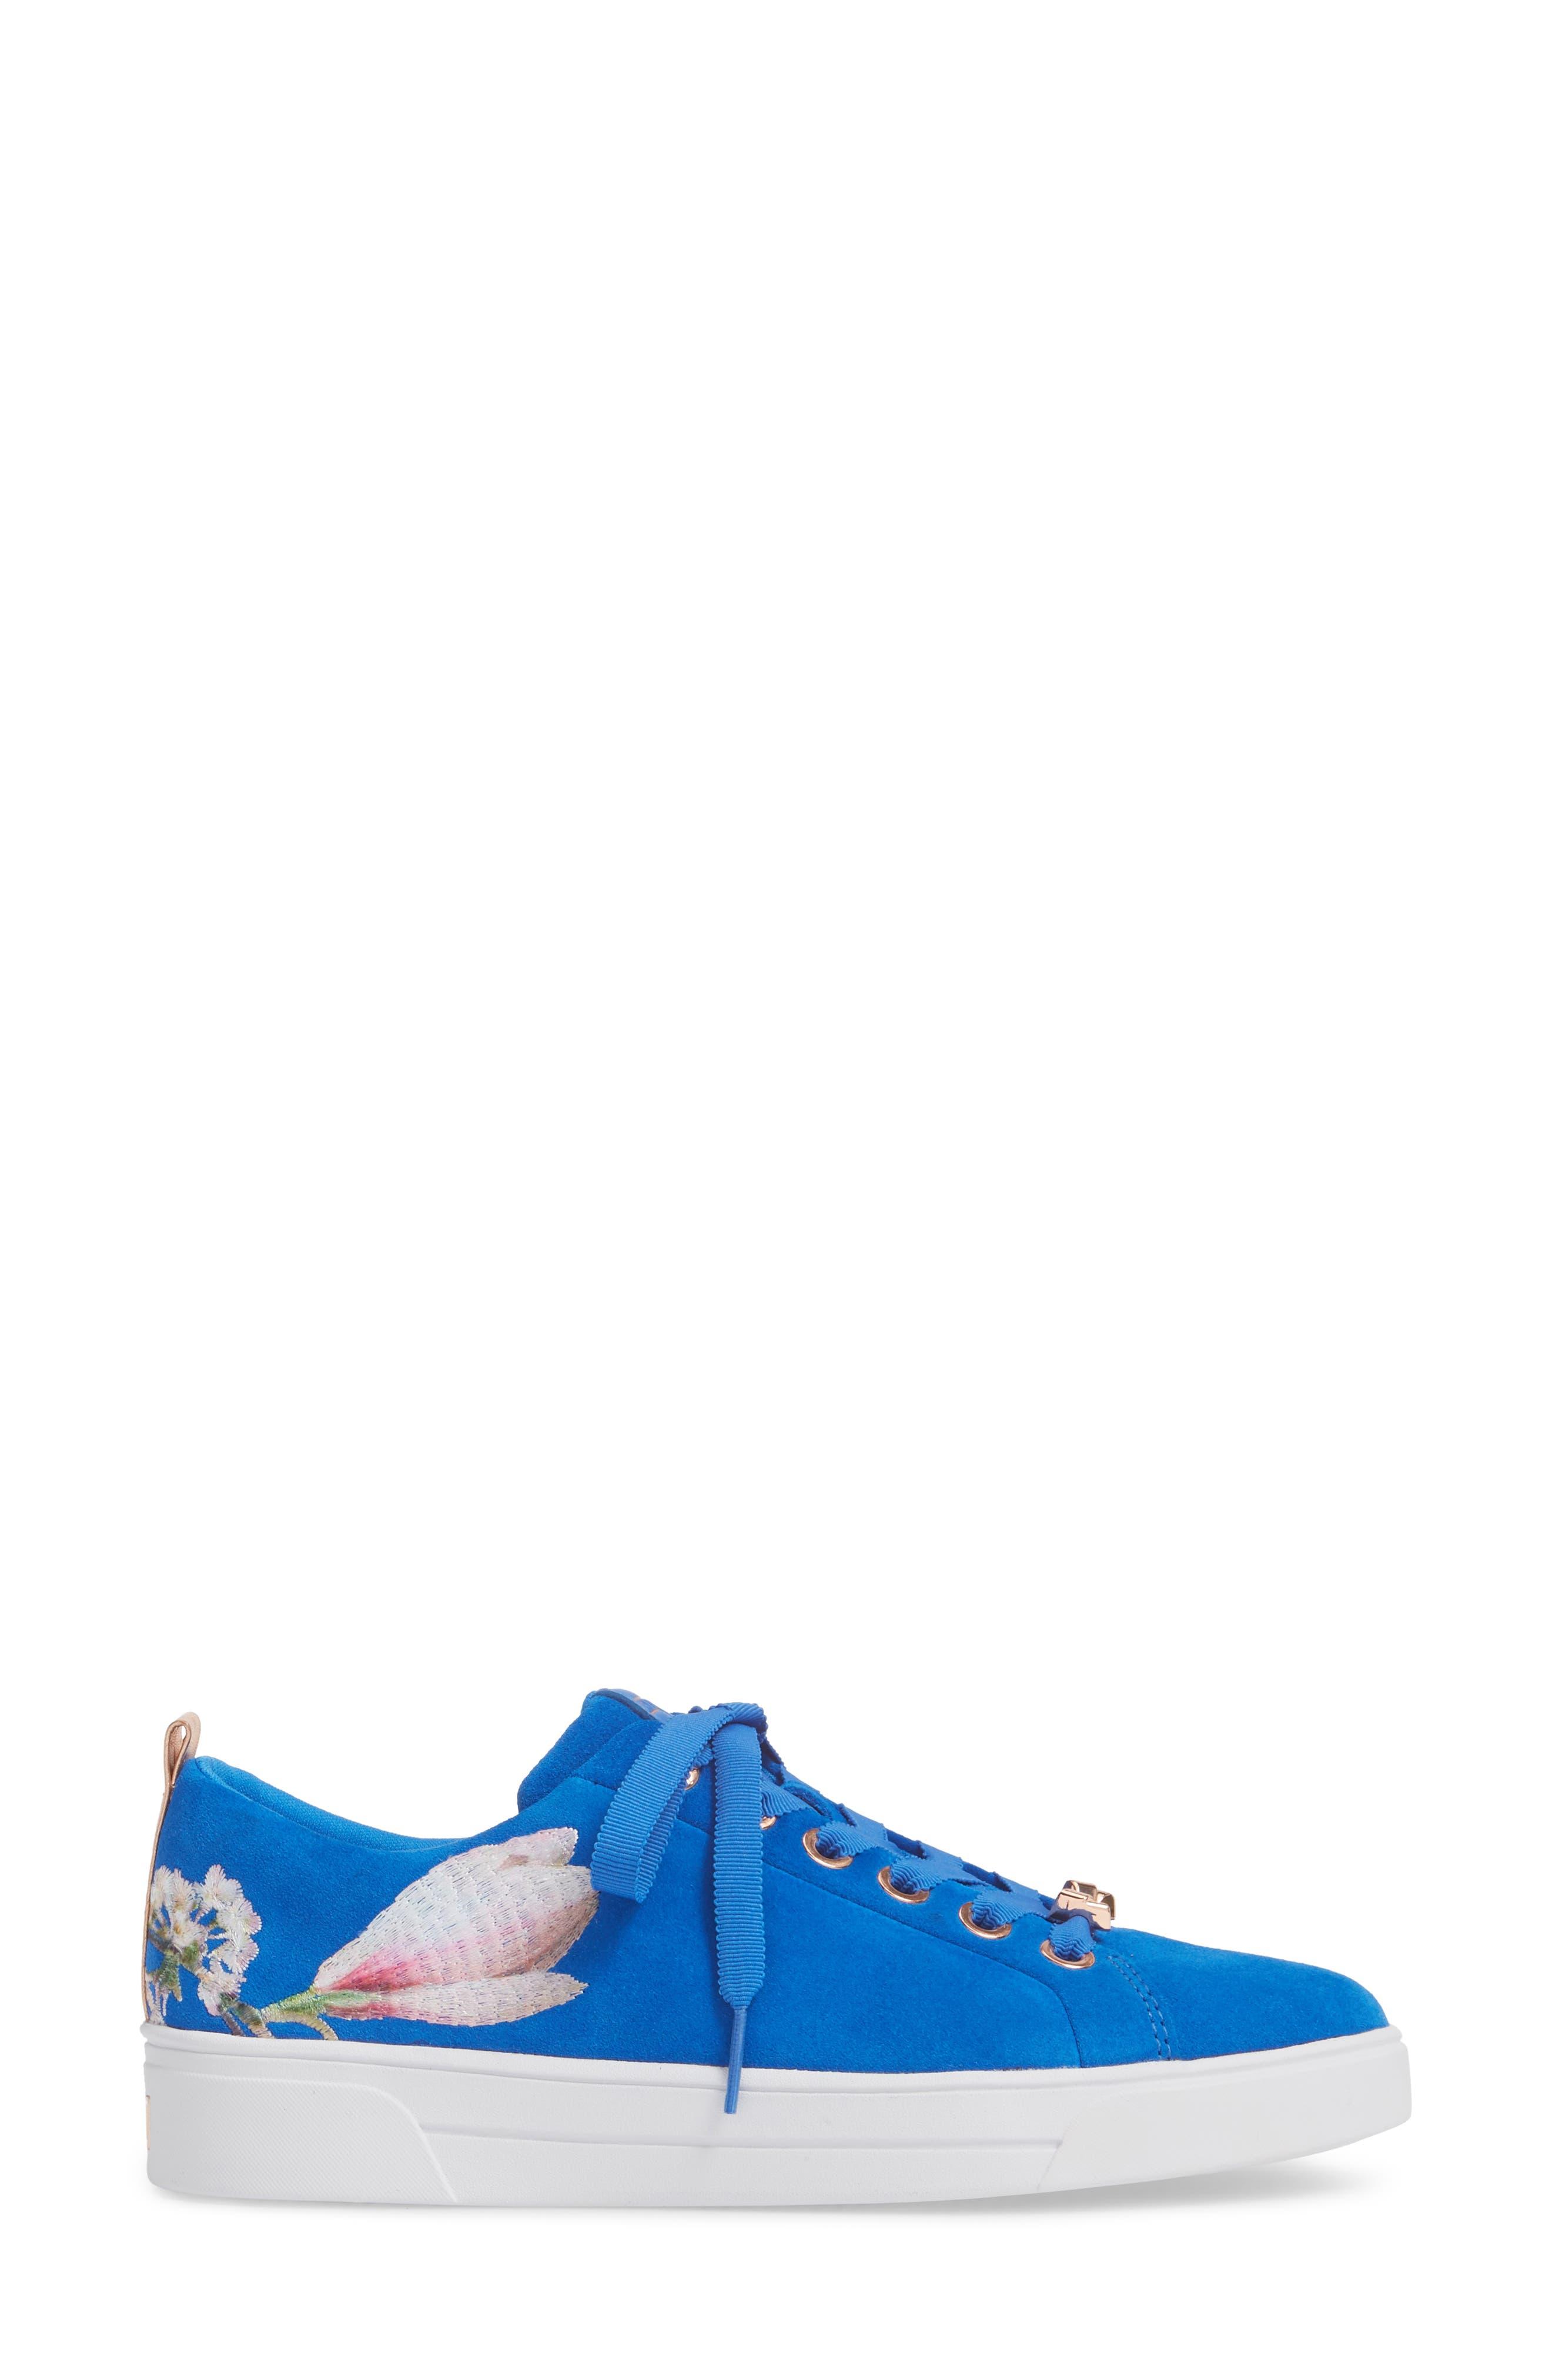 Eryin Sneaker,                             Alternate thumbnail 3, color,                             BLUE HARMONY PRINT SUEDE